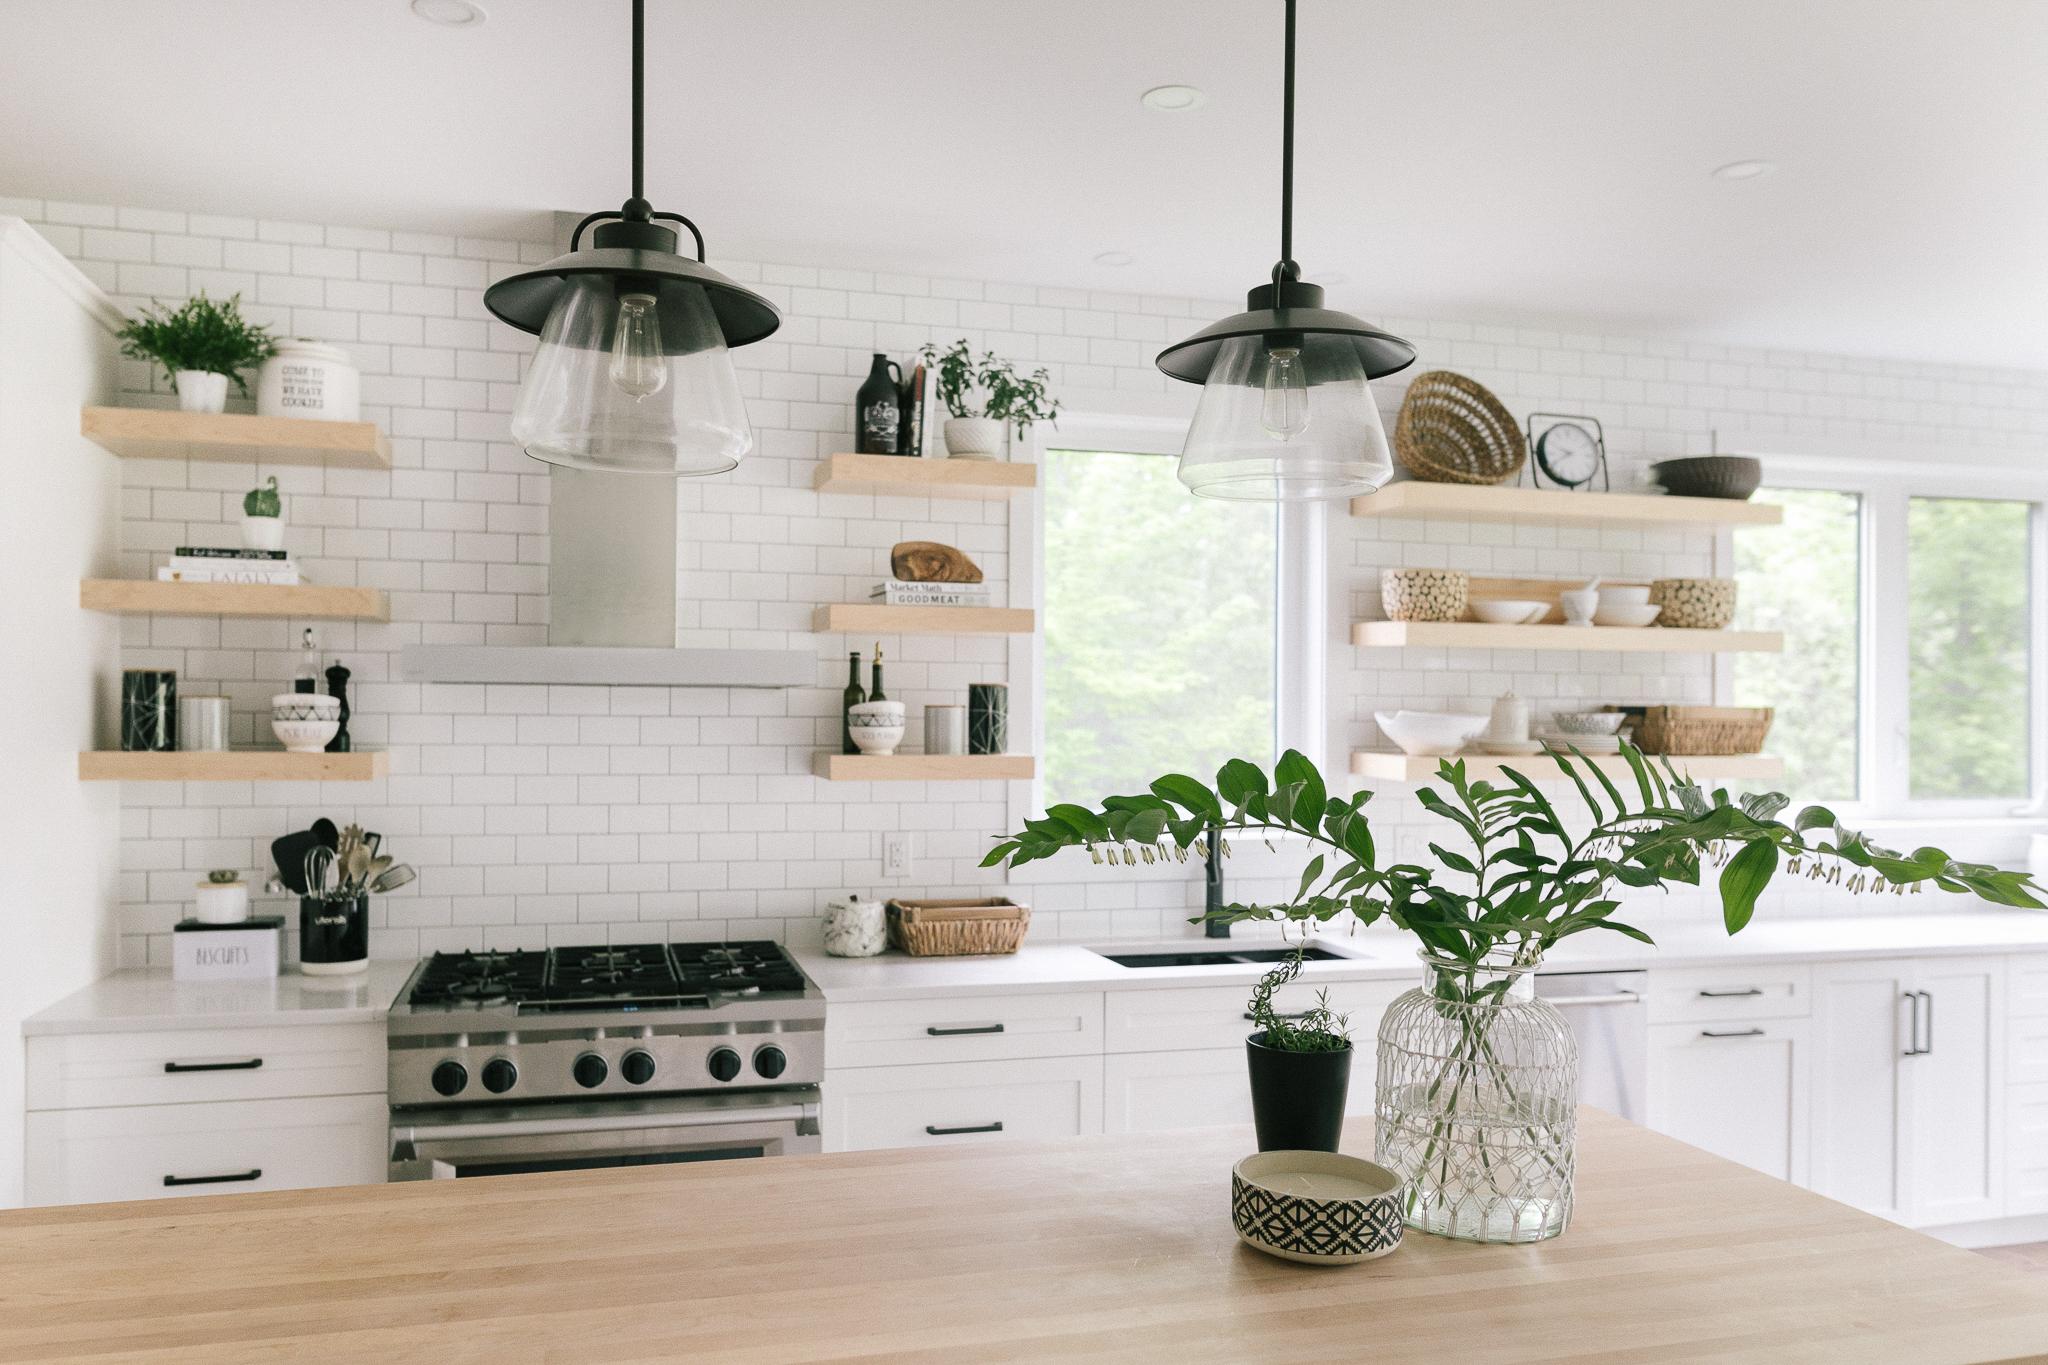 Interior-Design-Carp-Project-Kitchen-Industrial-Lighting